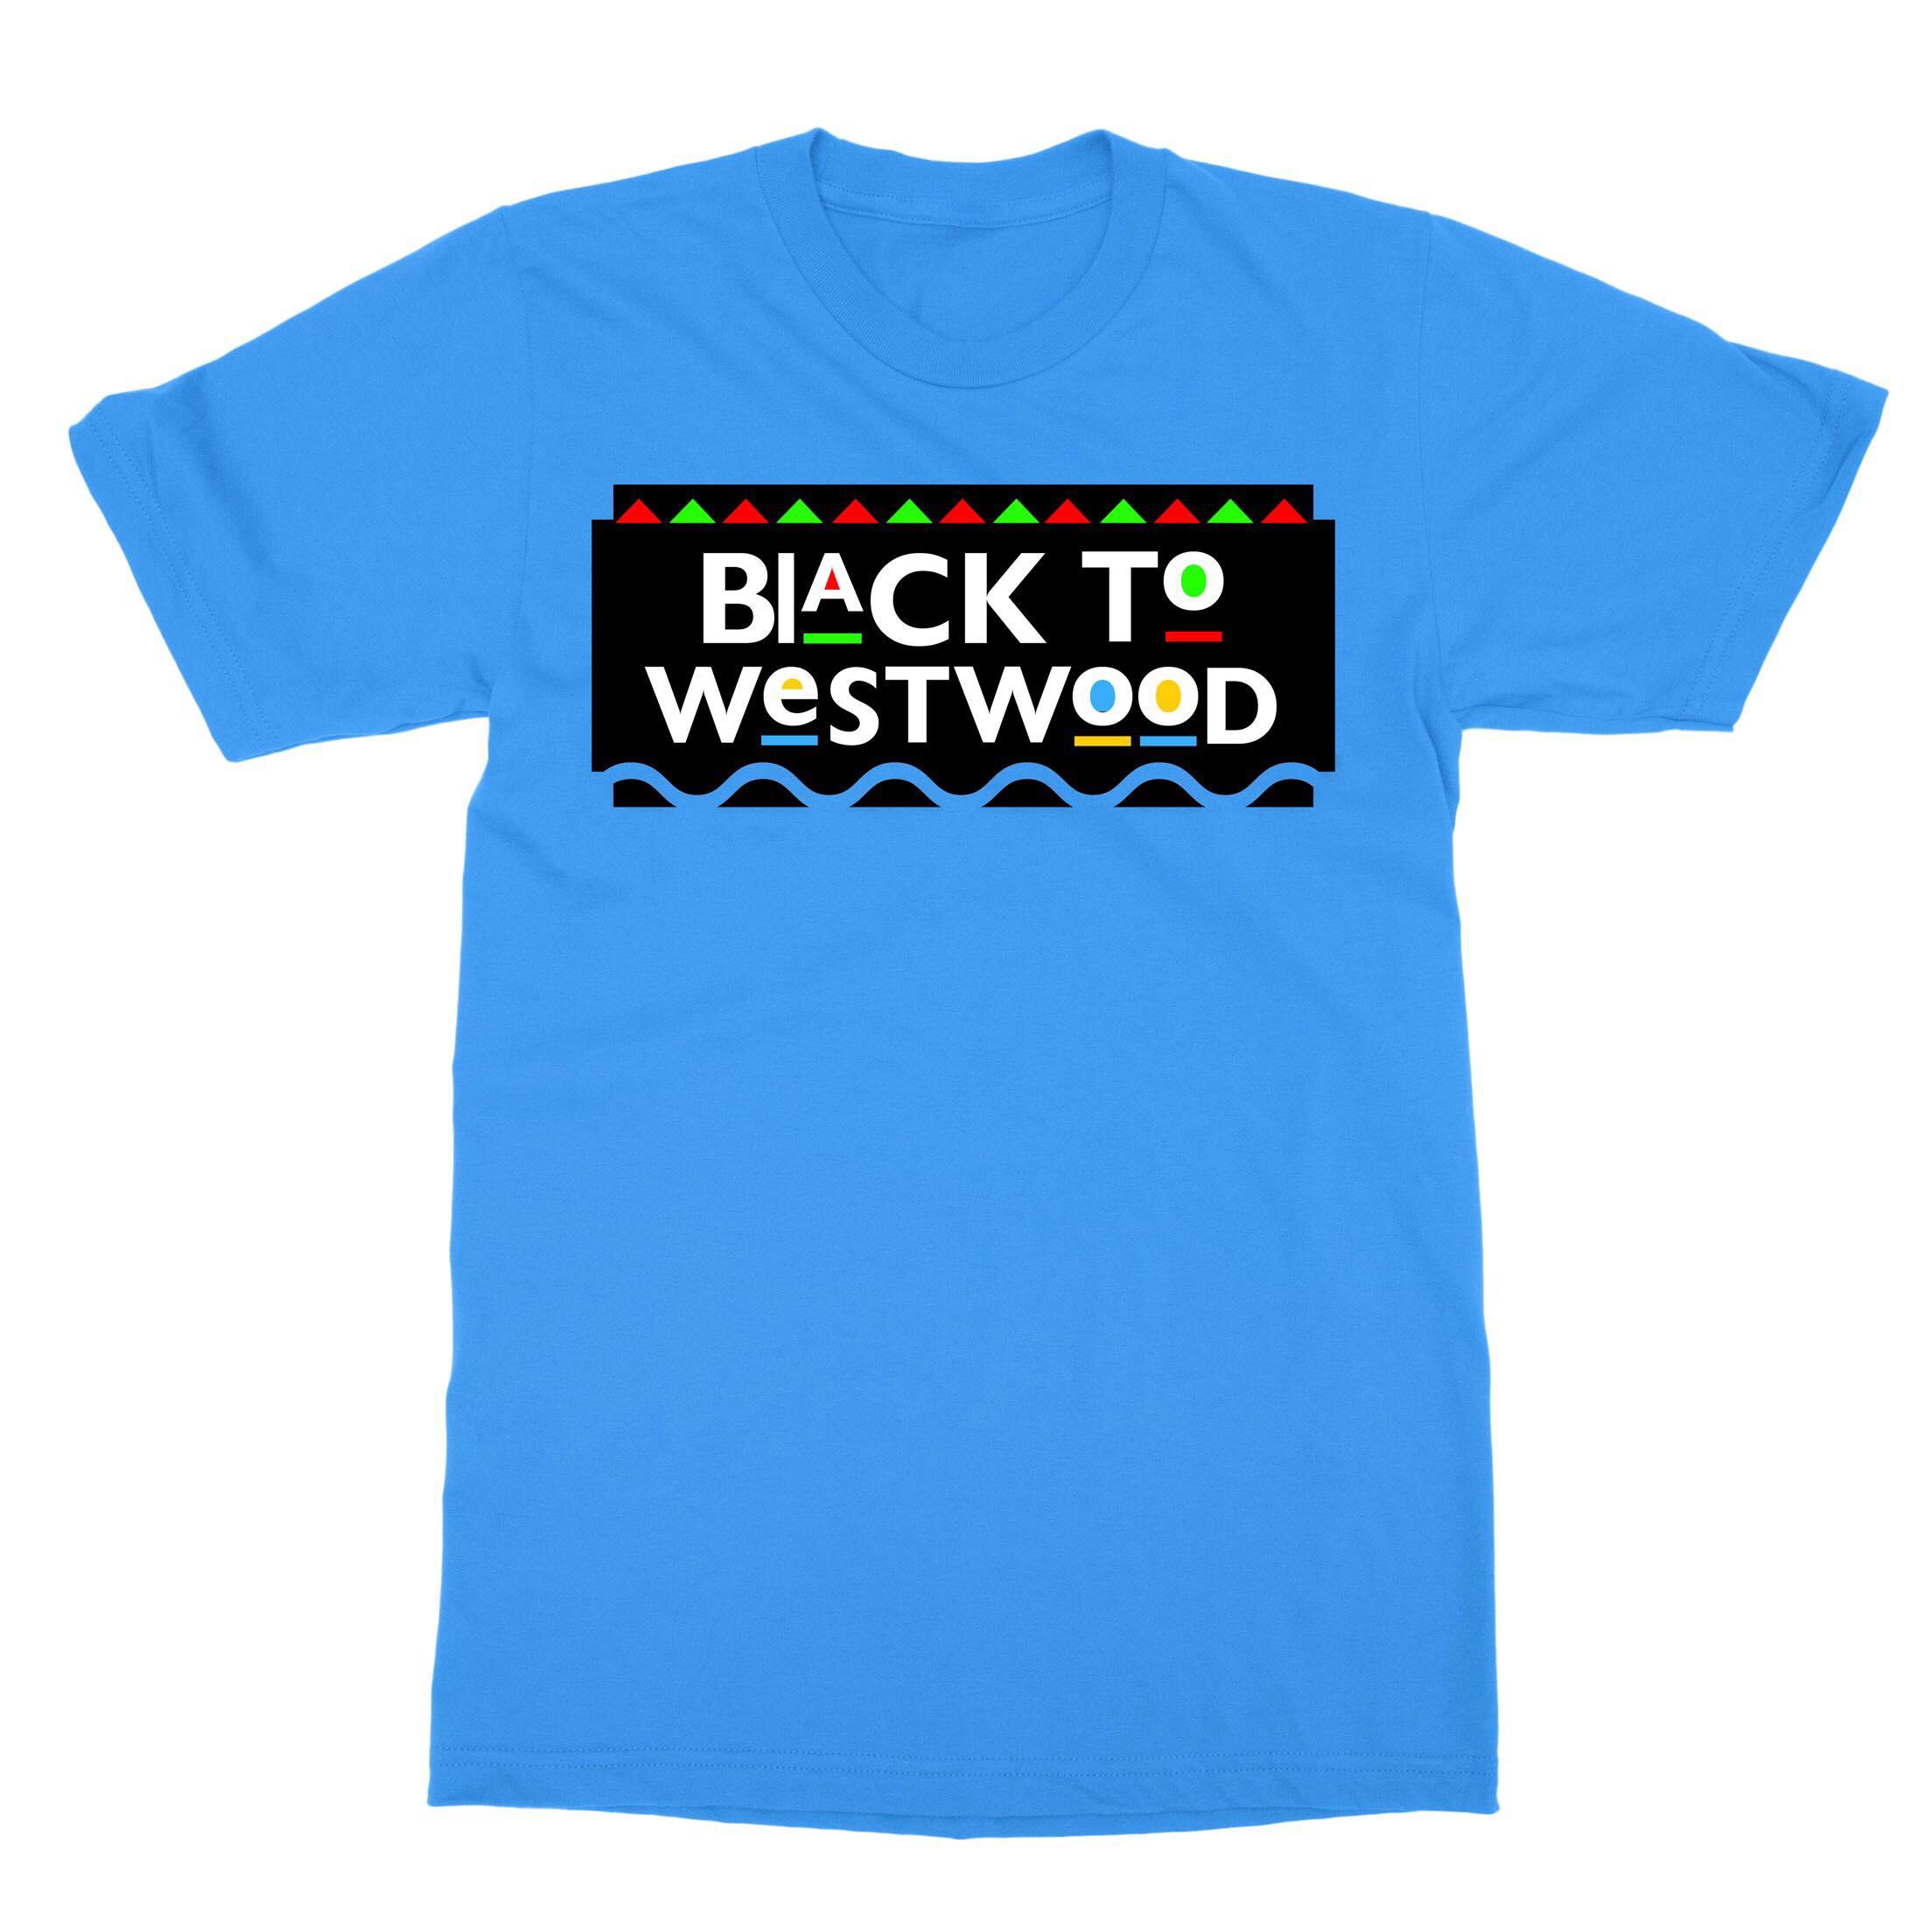 Black II Westwood Commemorative T-Shirt -  Adult's Men X-Large